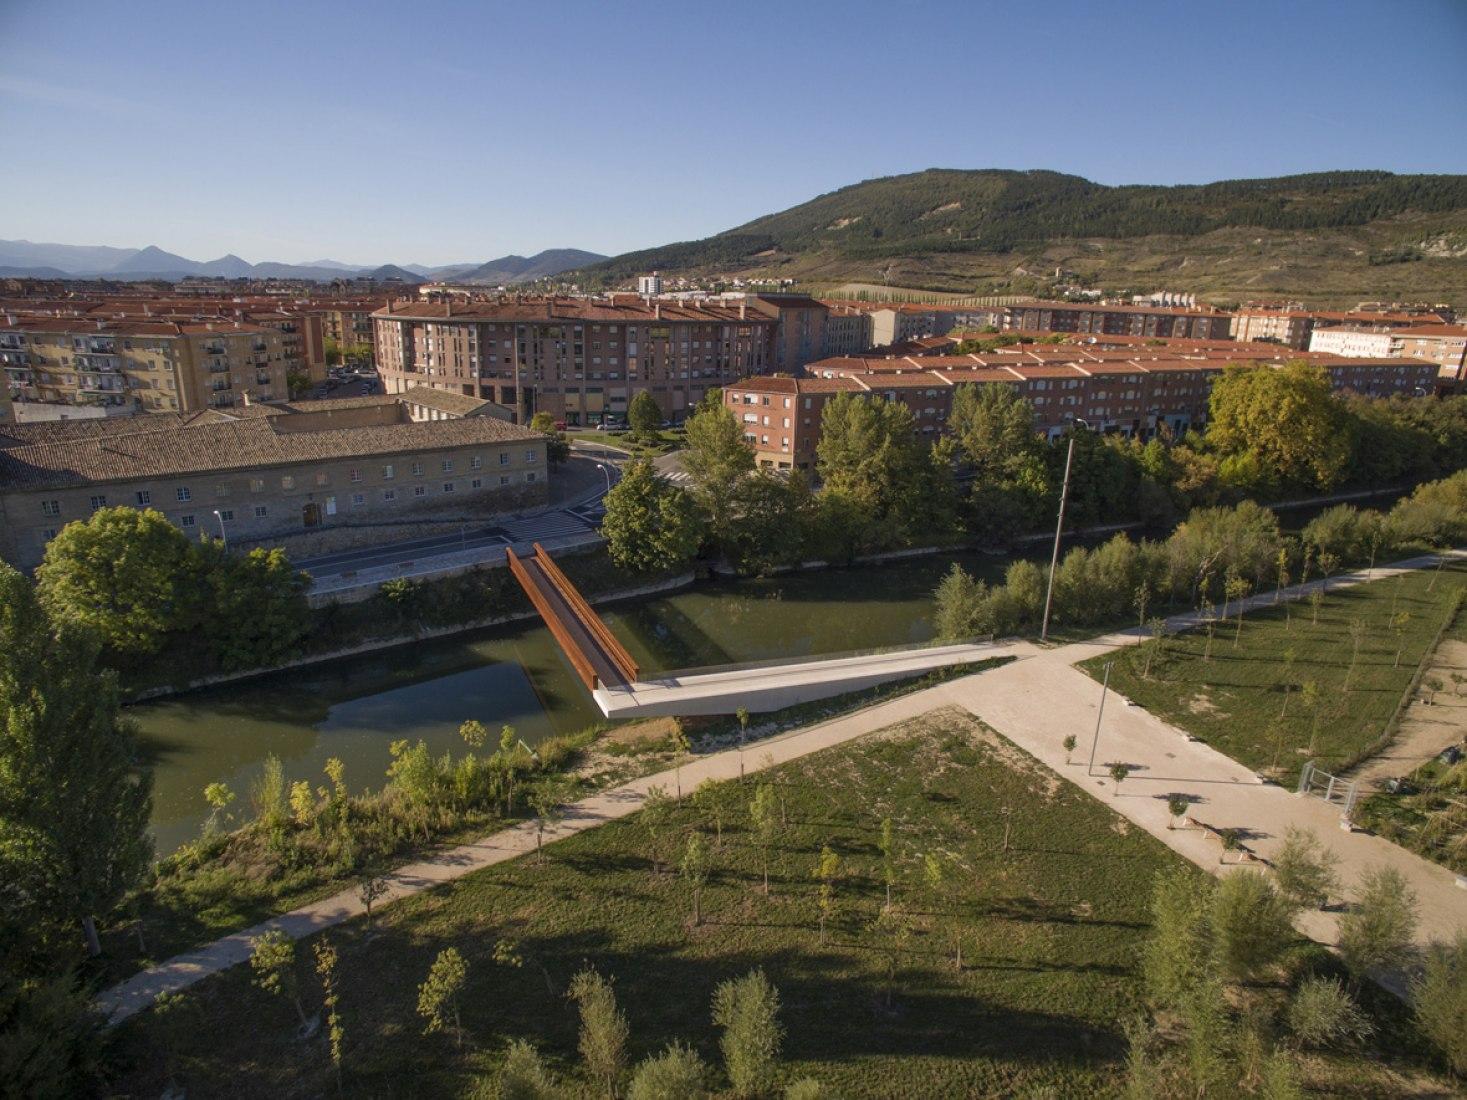 Aerial view ot the pedestrian bridge in Aranzadi Park by Peralta Ayesa arquitectos. Photography © Eduardo Berián / Hidrone.